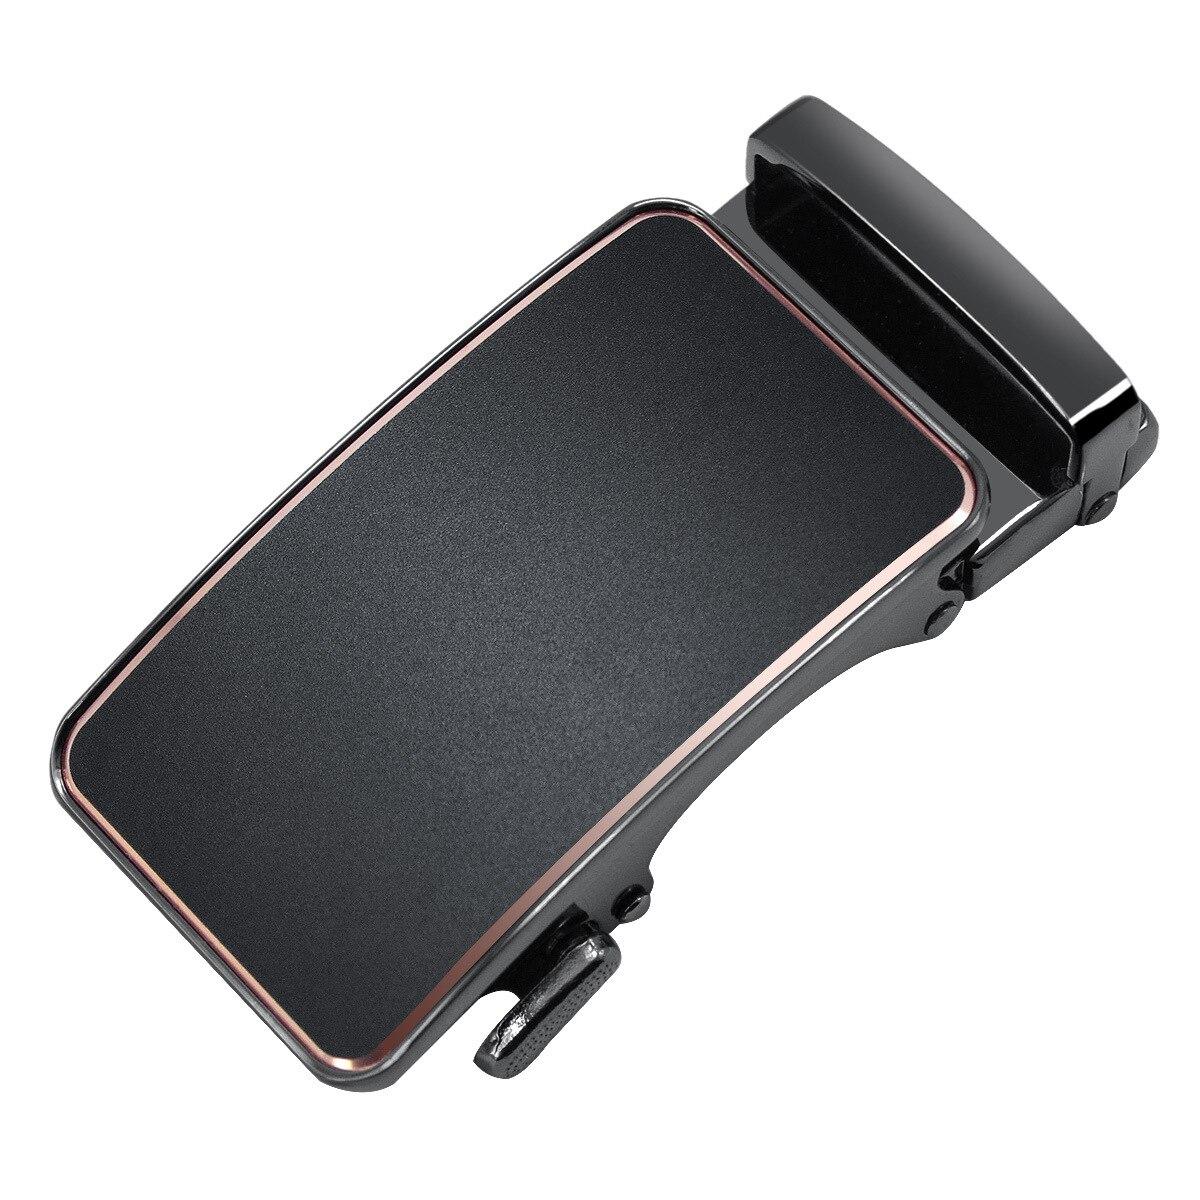 Personalized Zinc Alloy Automatic Belt Buckle Custom Engraved Men's Leather Belt Head Mens Accessories Belt Buckles Mens Jewelry